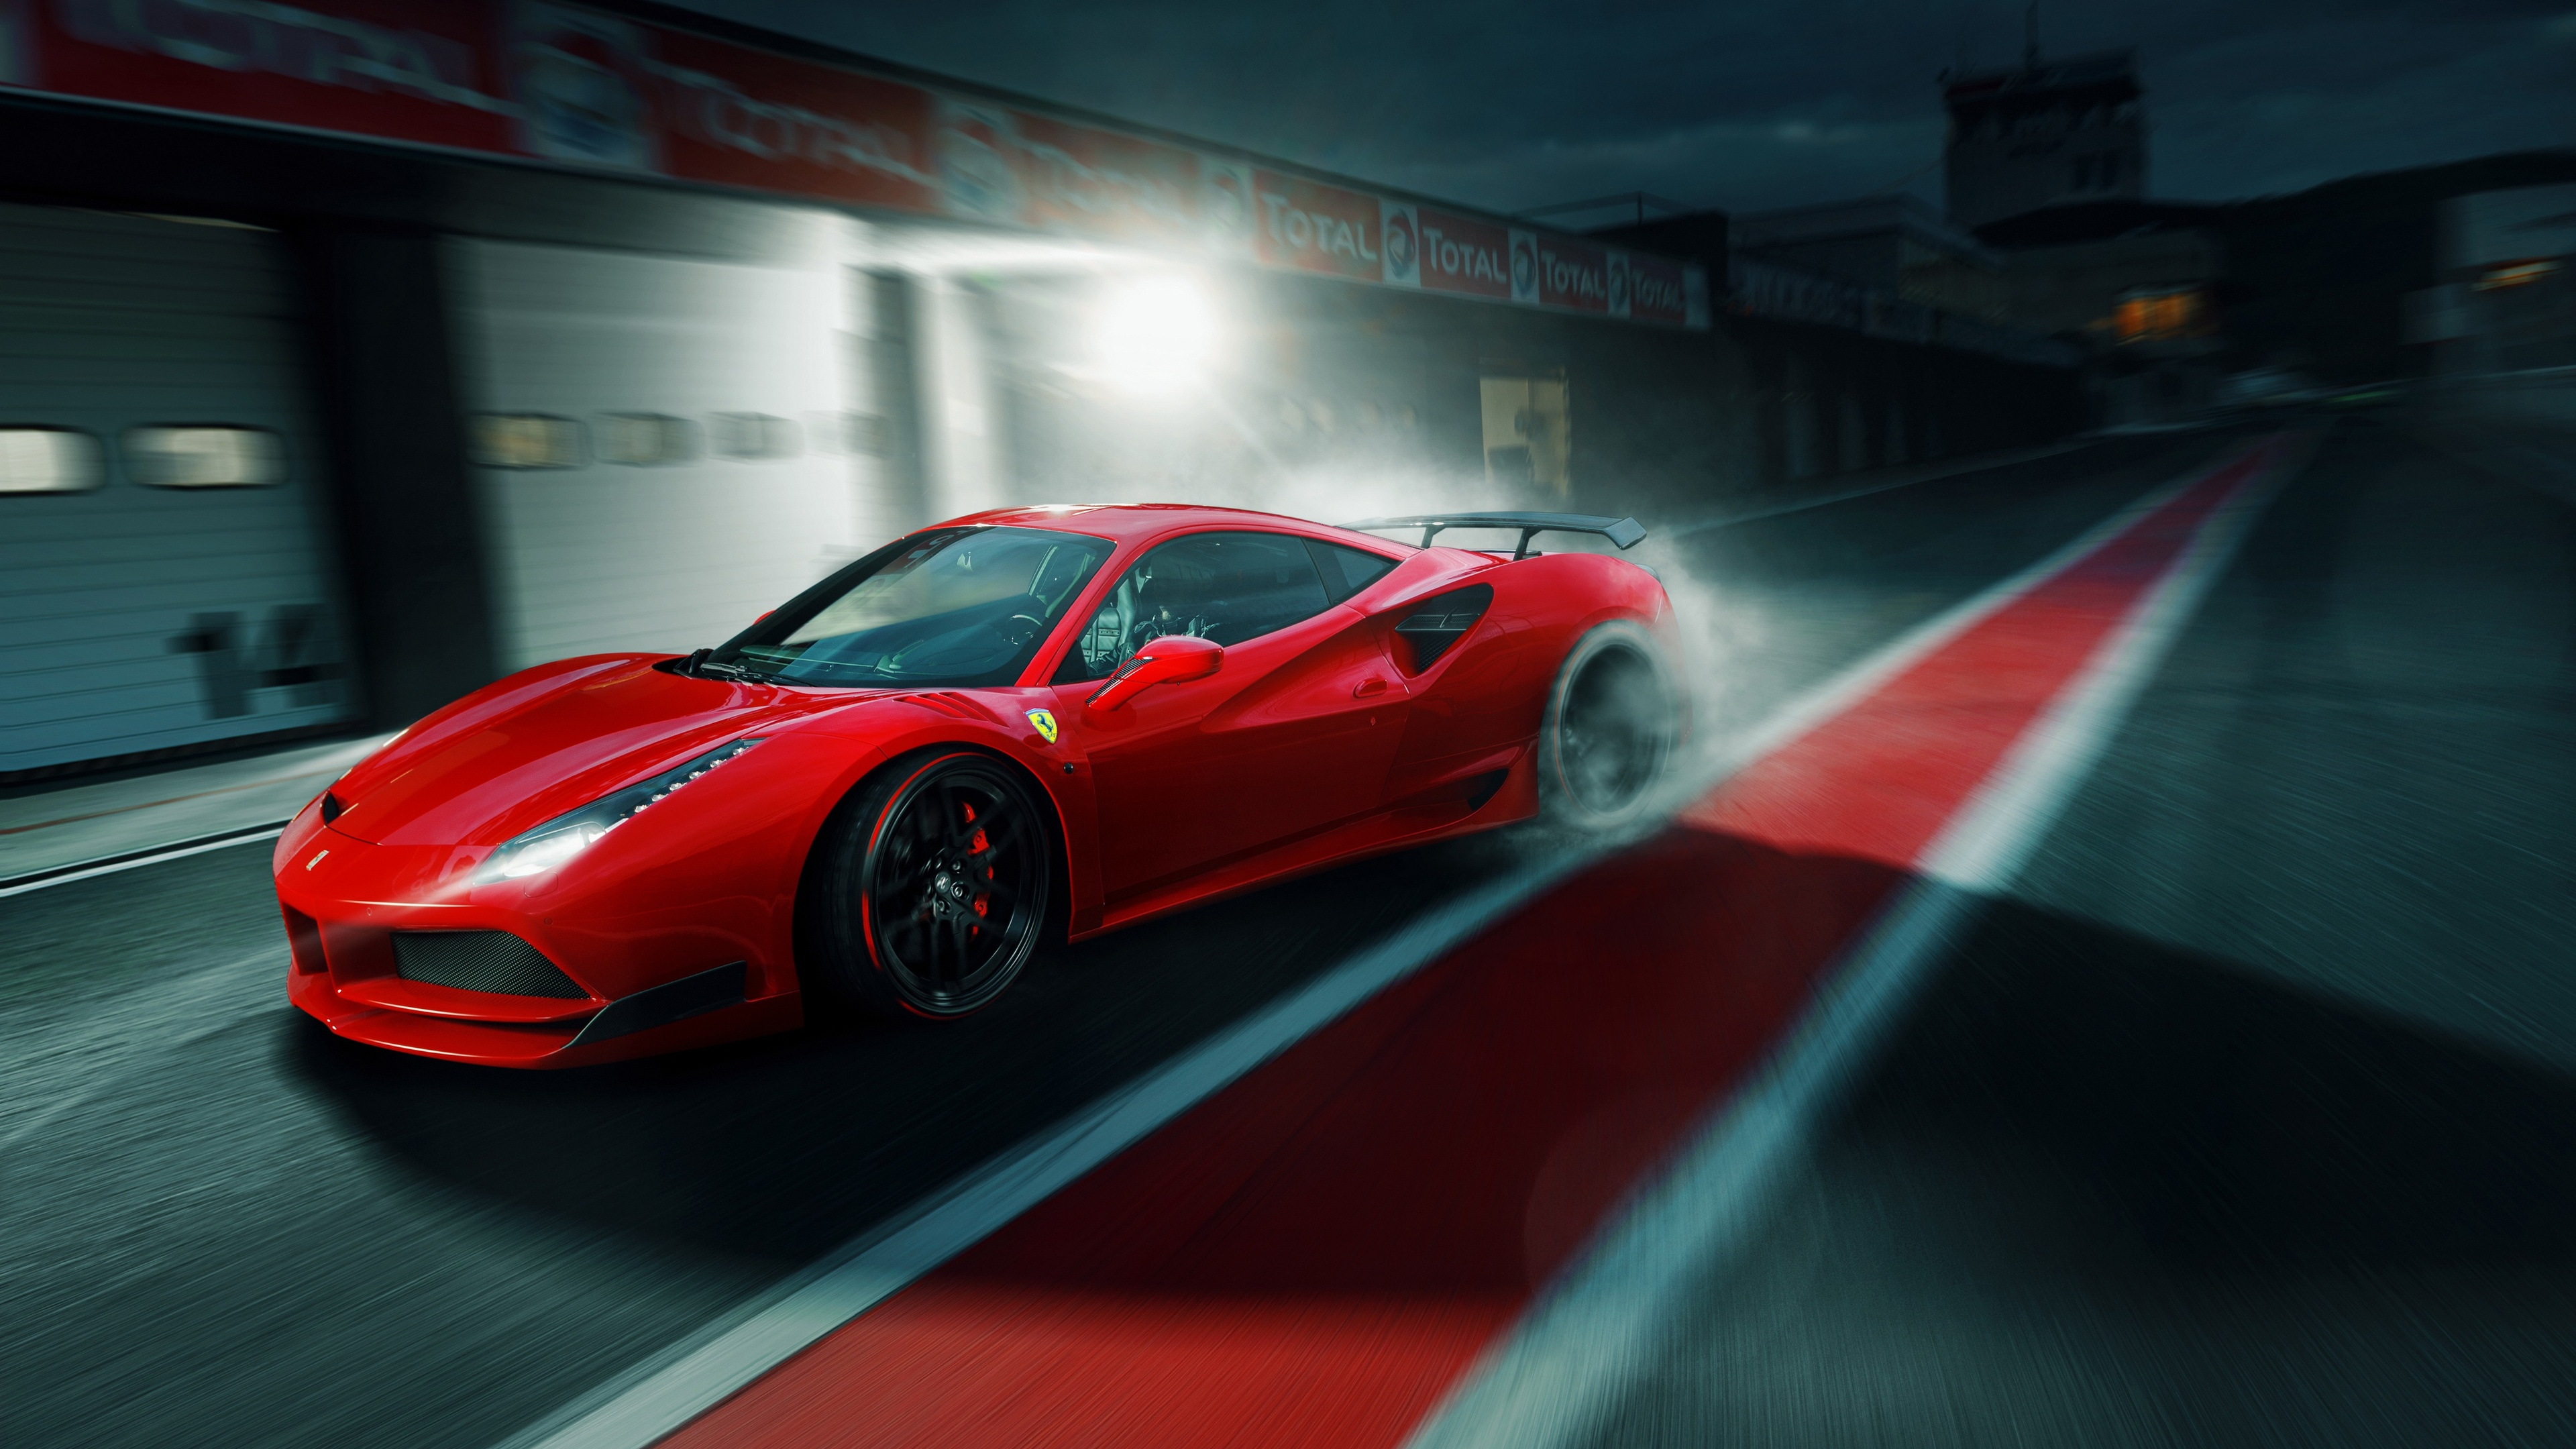 2017 ferrari 488 gtb 1539105497 - 2017 Ferrari 488 Gtb - hd-wallpapers, ferrari wallpapers, ferrari 488 wallpapers, 4k-wallpapers, 2017 cars wallpapers